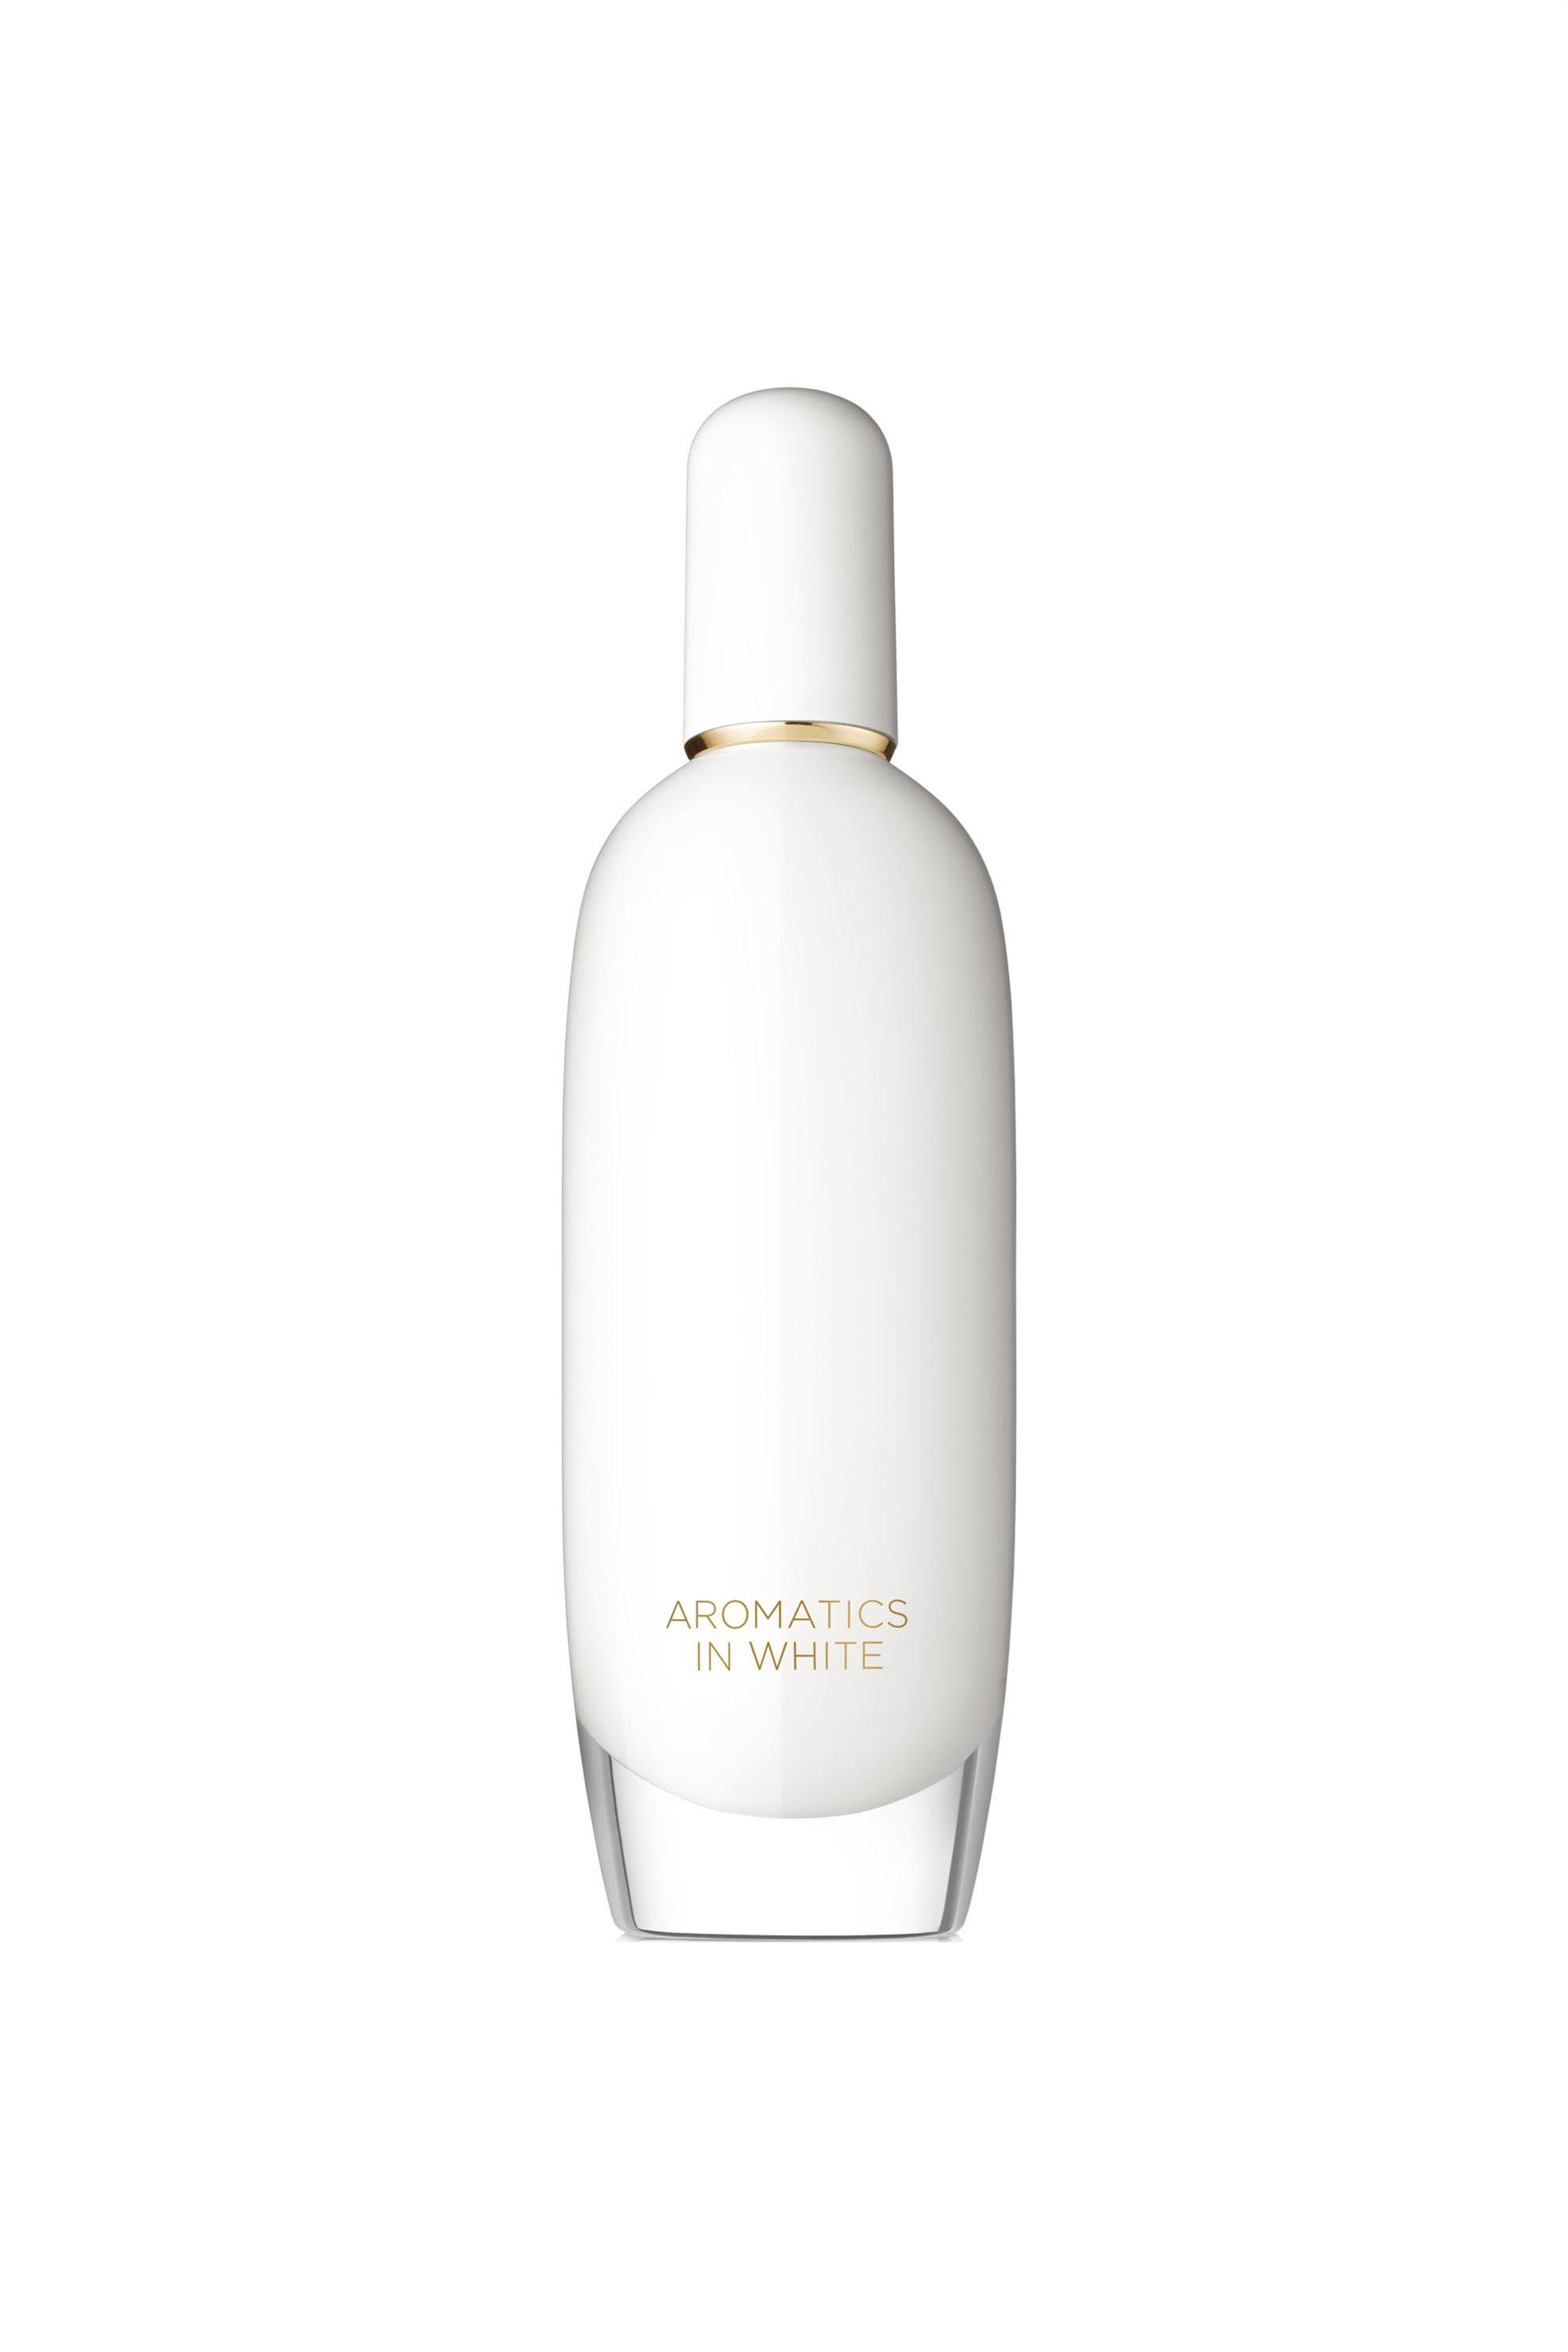 Clinique Aromatics in White EdP 50 ml - Z9F2010000 ομορφια   καλλυντικα επιλεκτικησ   αρώματα   γυναικεία αρώματα   eau de parfum